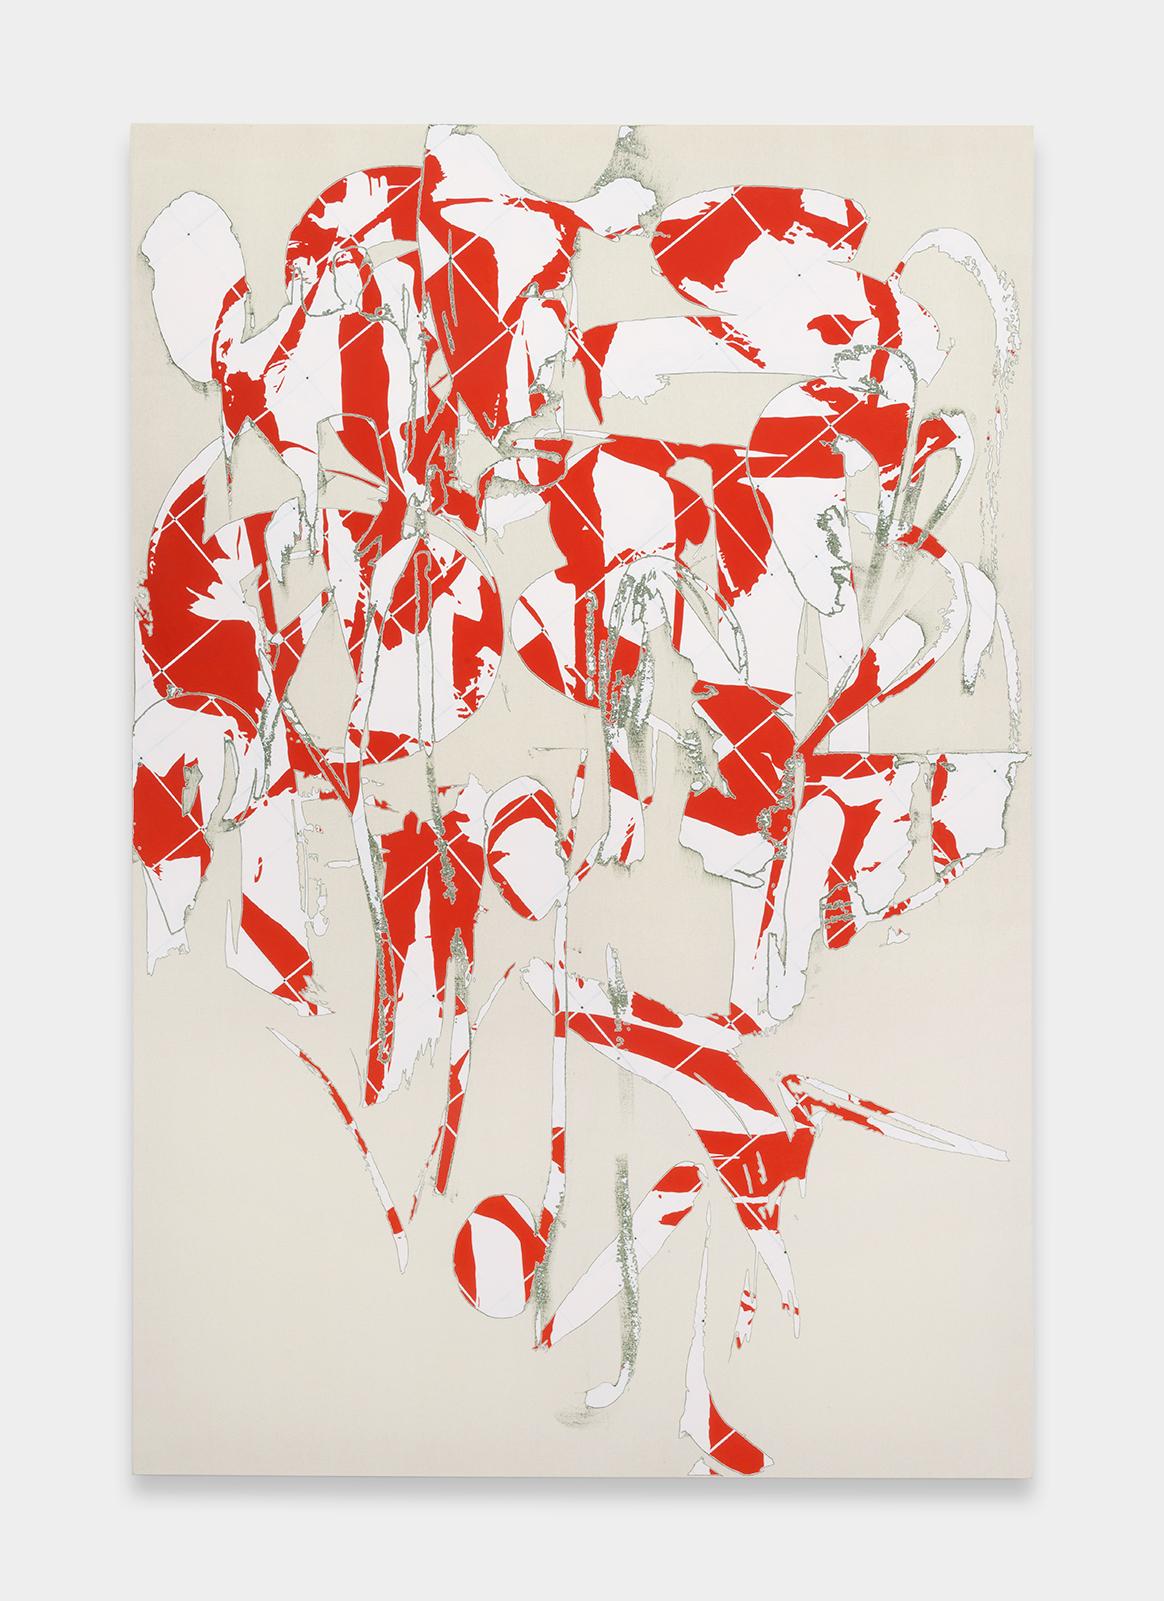 Zak Prekop  Two Grids, Four Colors  2015 Oil on canvas 96h x 64w in ZP339